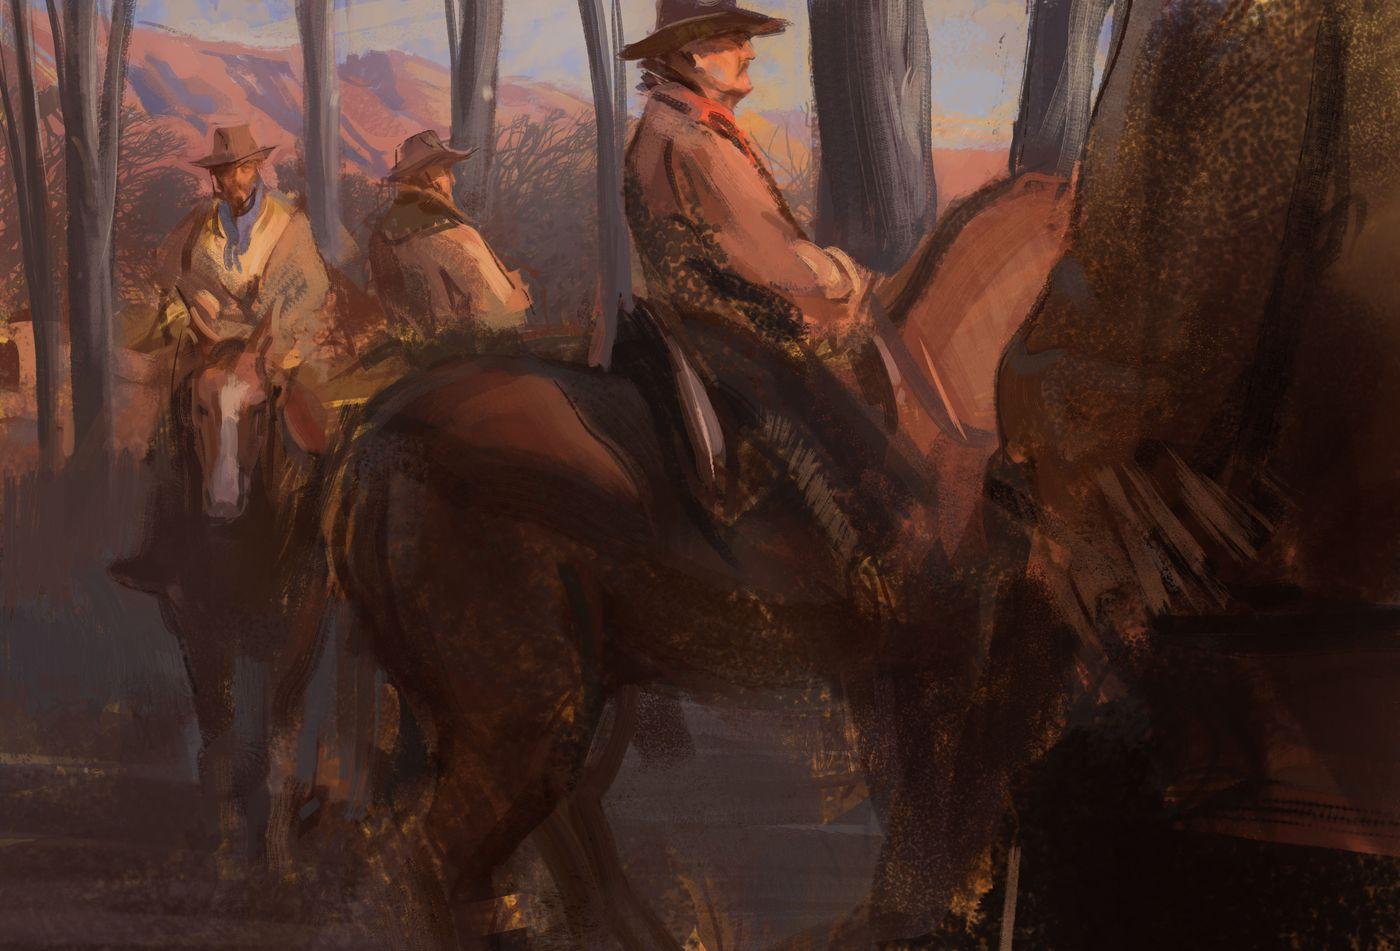 Cowboys%2 C%20maxwell%20alexander555 Sergiranzo